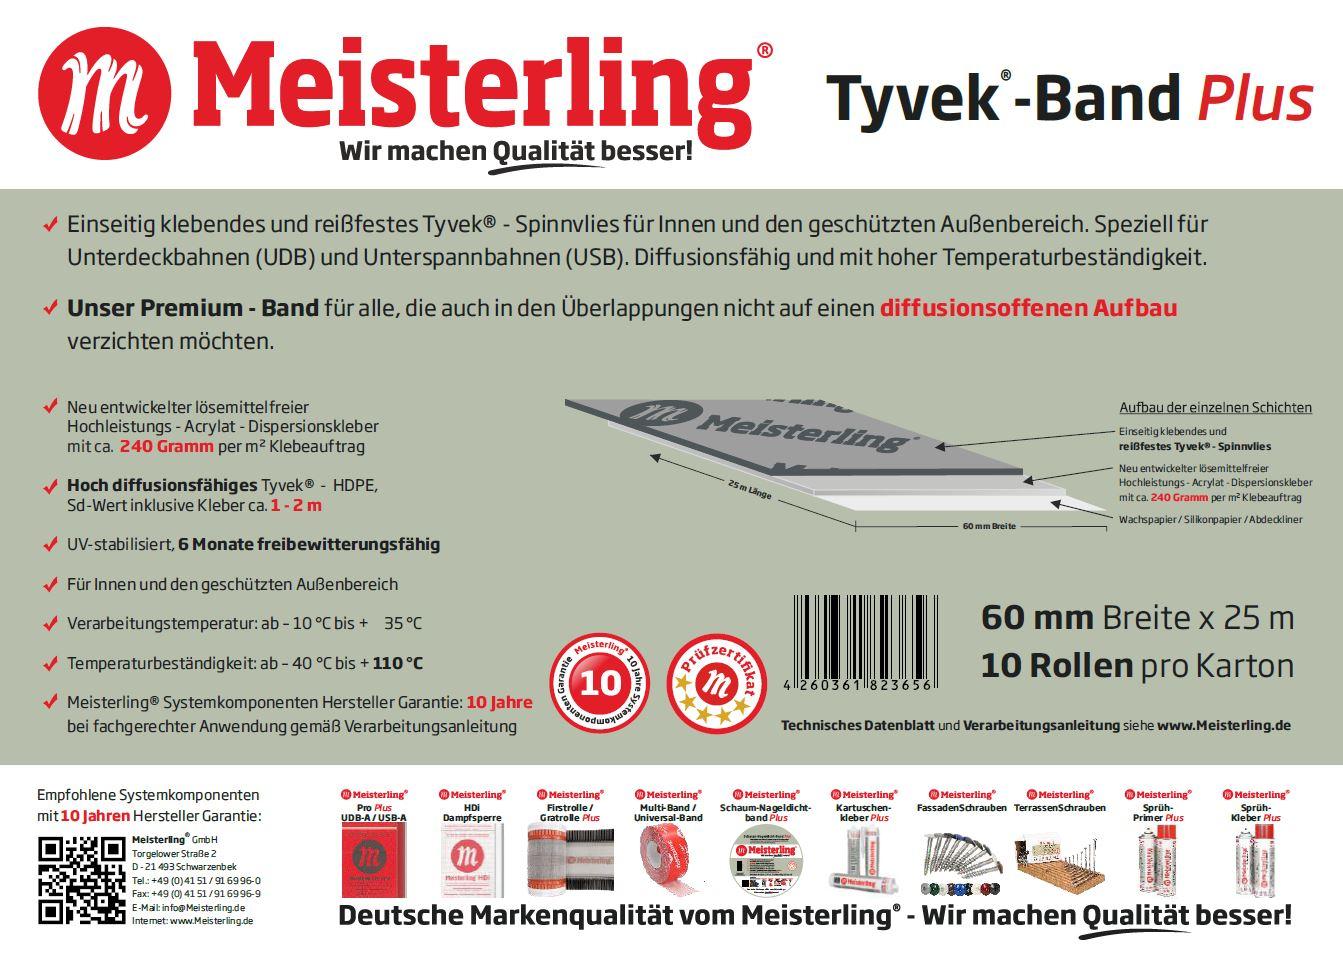 Meisterling® Tyvek® - Band PLUS Technische Daten